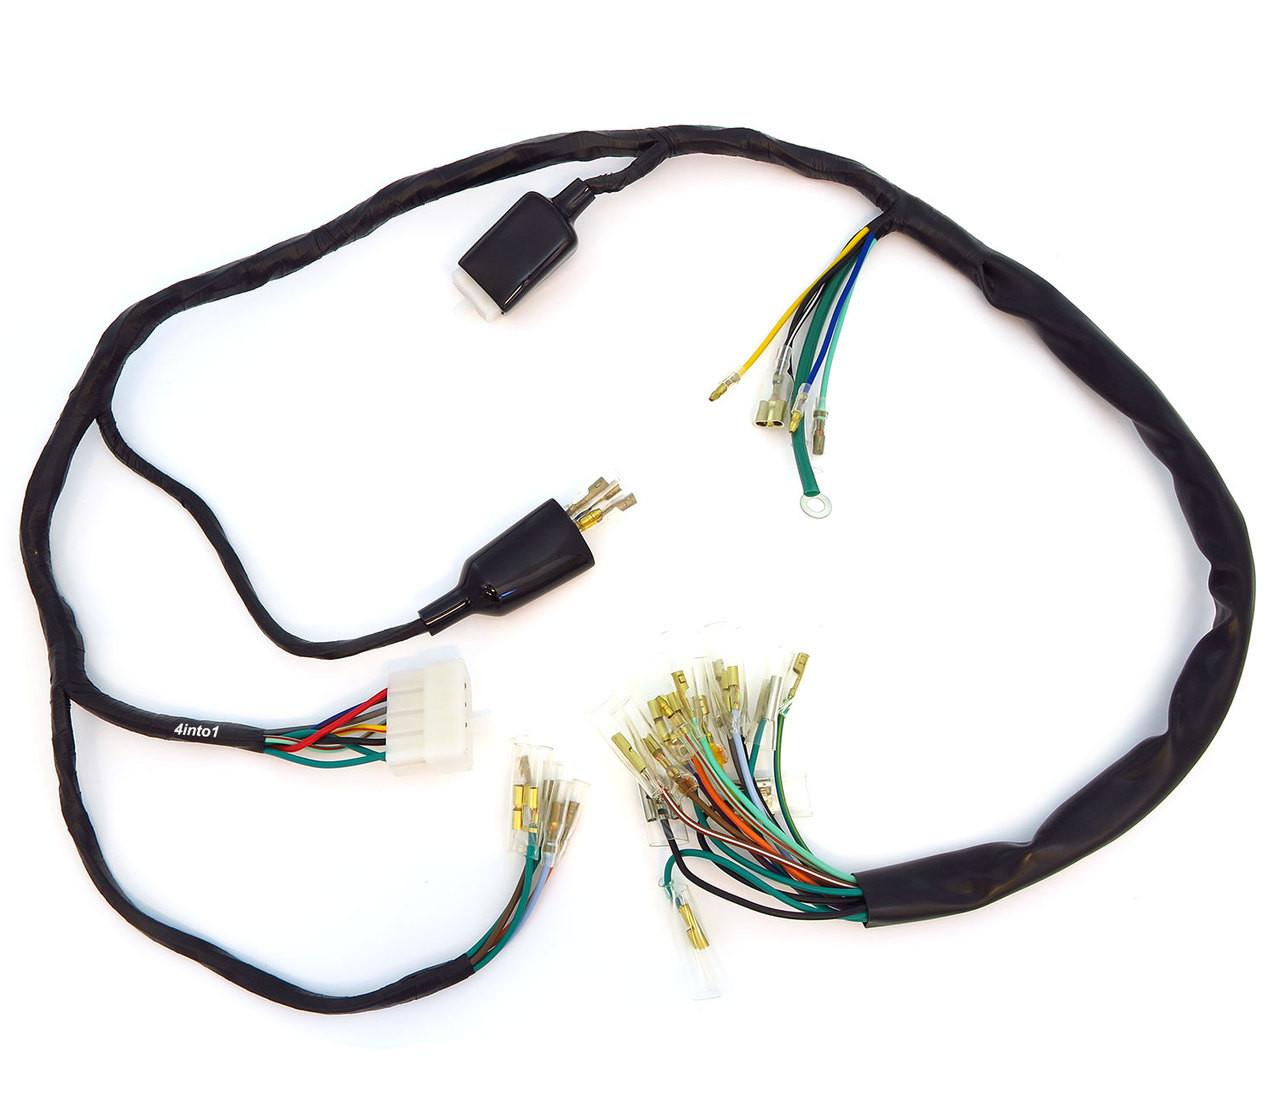 main wiring harness 32100 323 040 honda cb500k 1972 1973main wiring harness 10 [ 1280 x 1113 Pixel ]